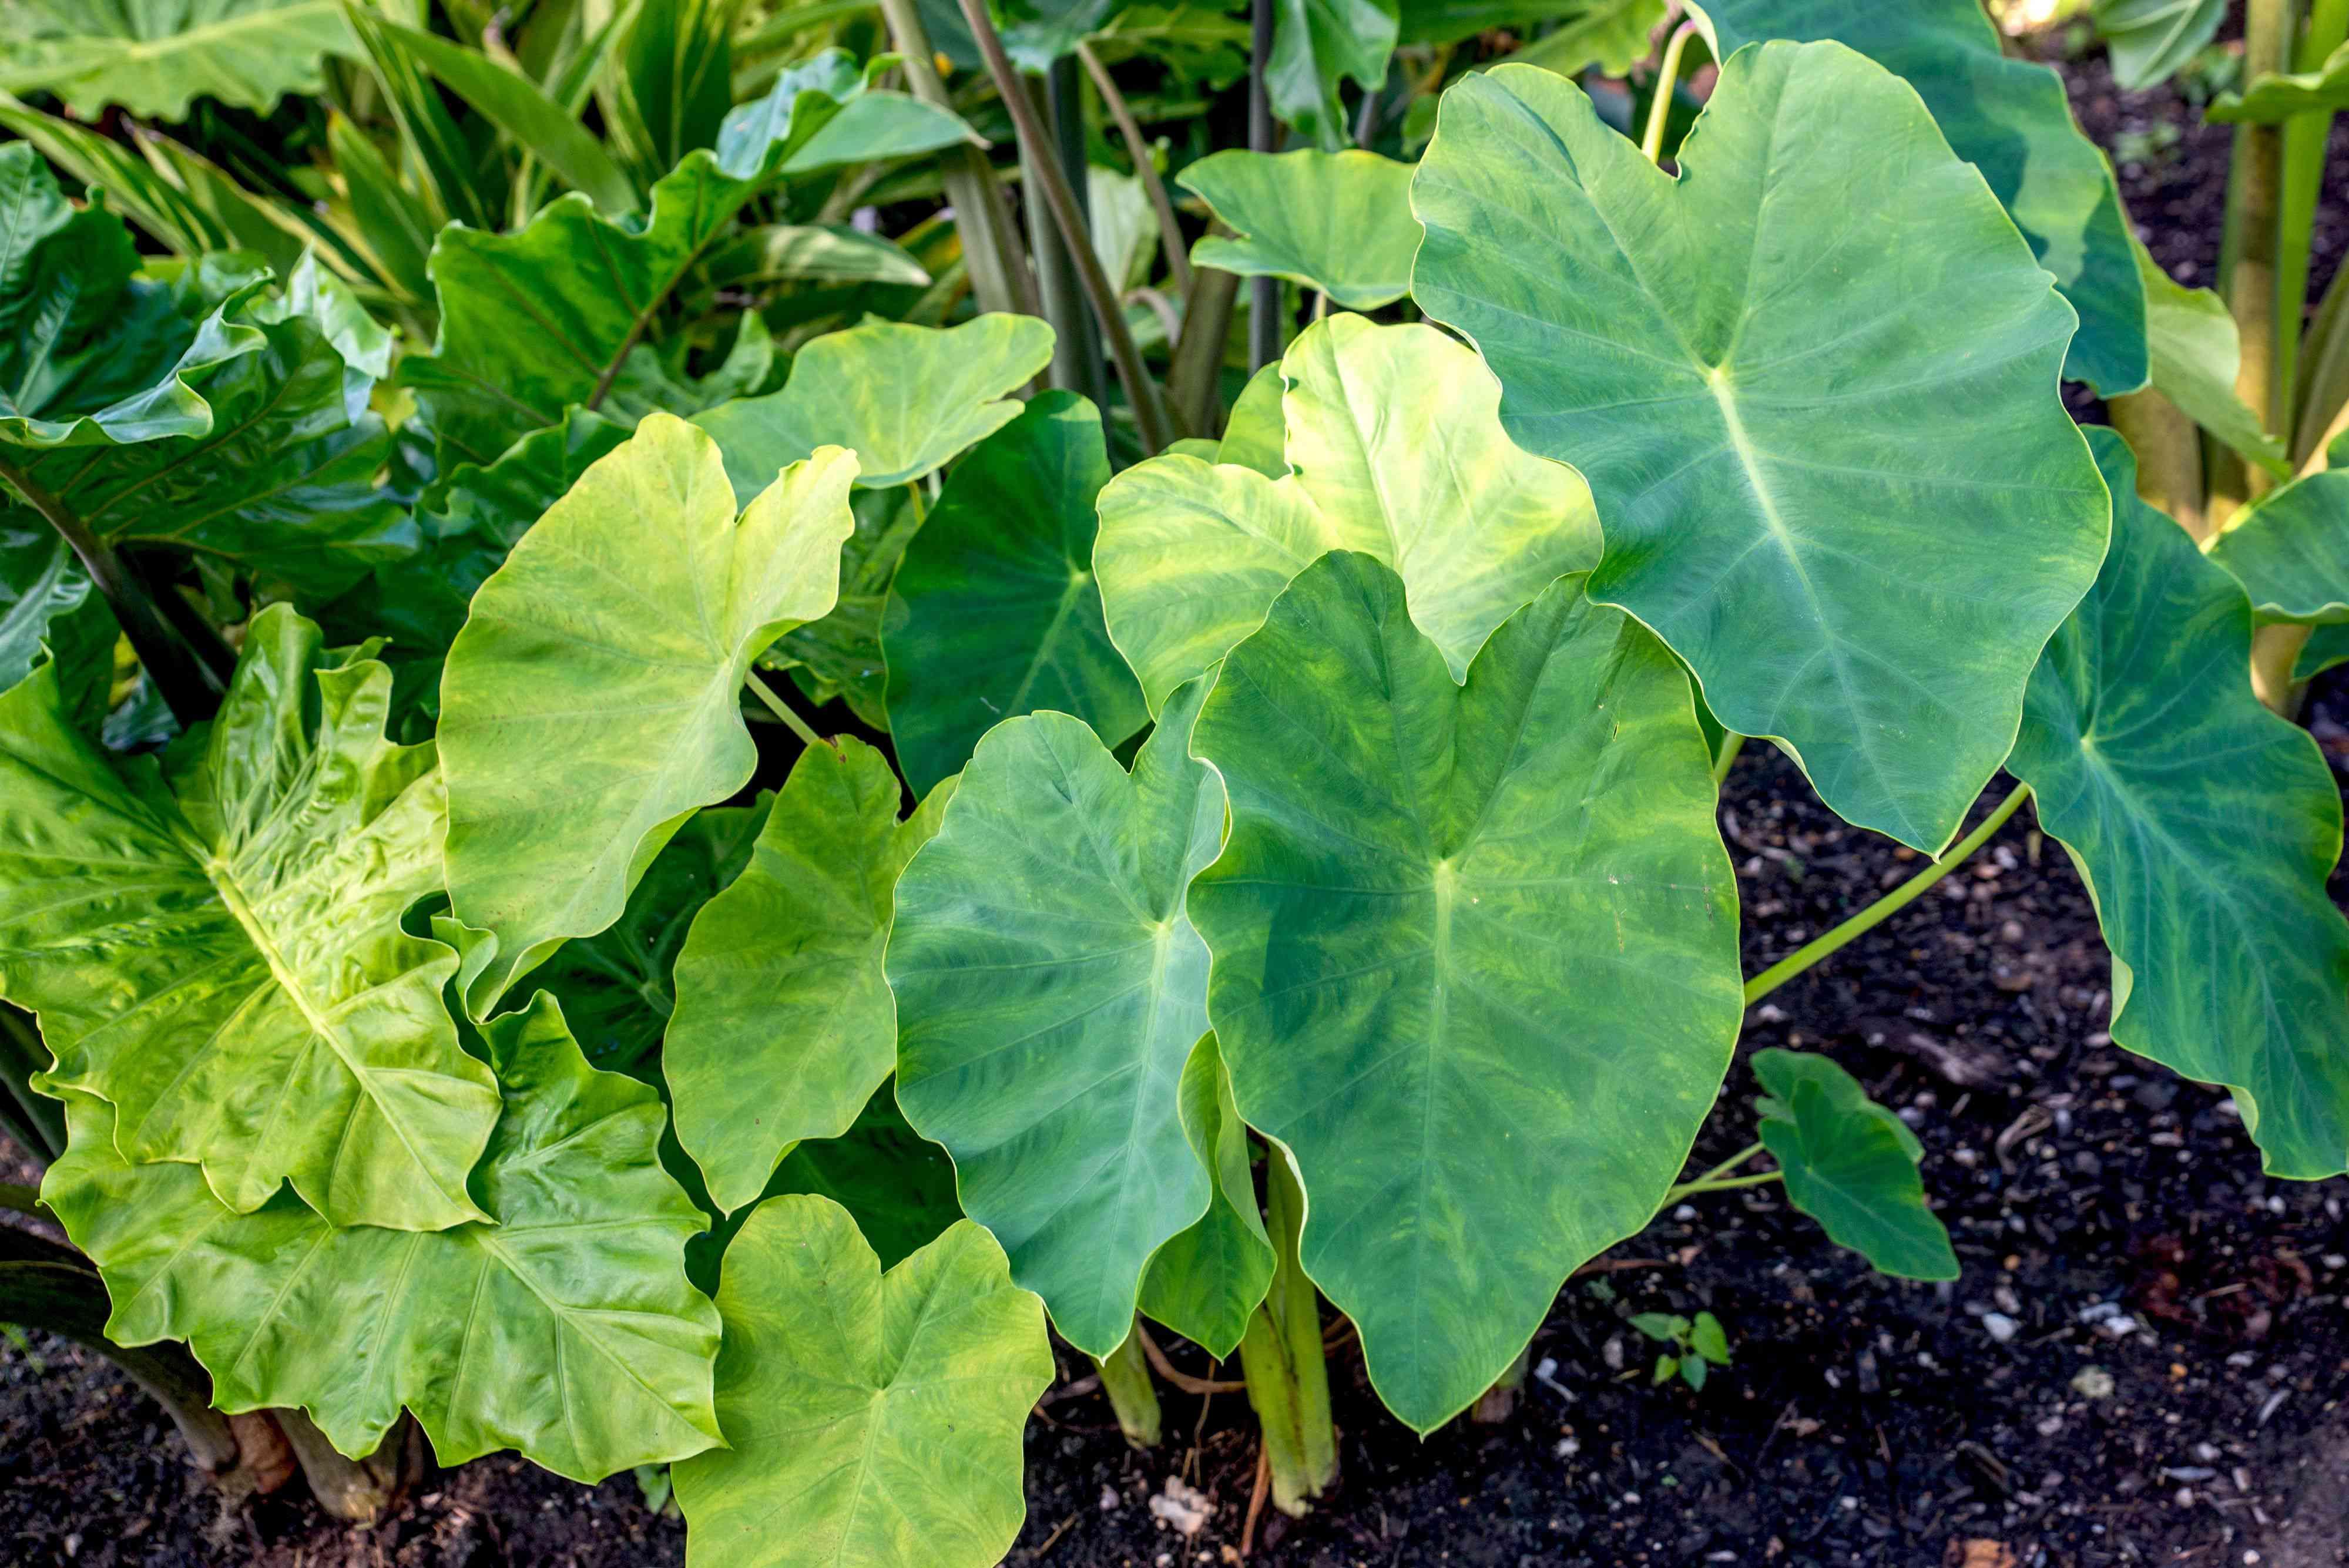 Elephant ear plant with large heart-shaped leaves